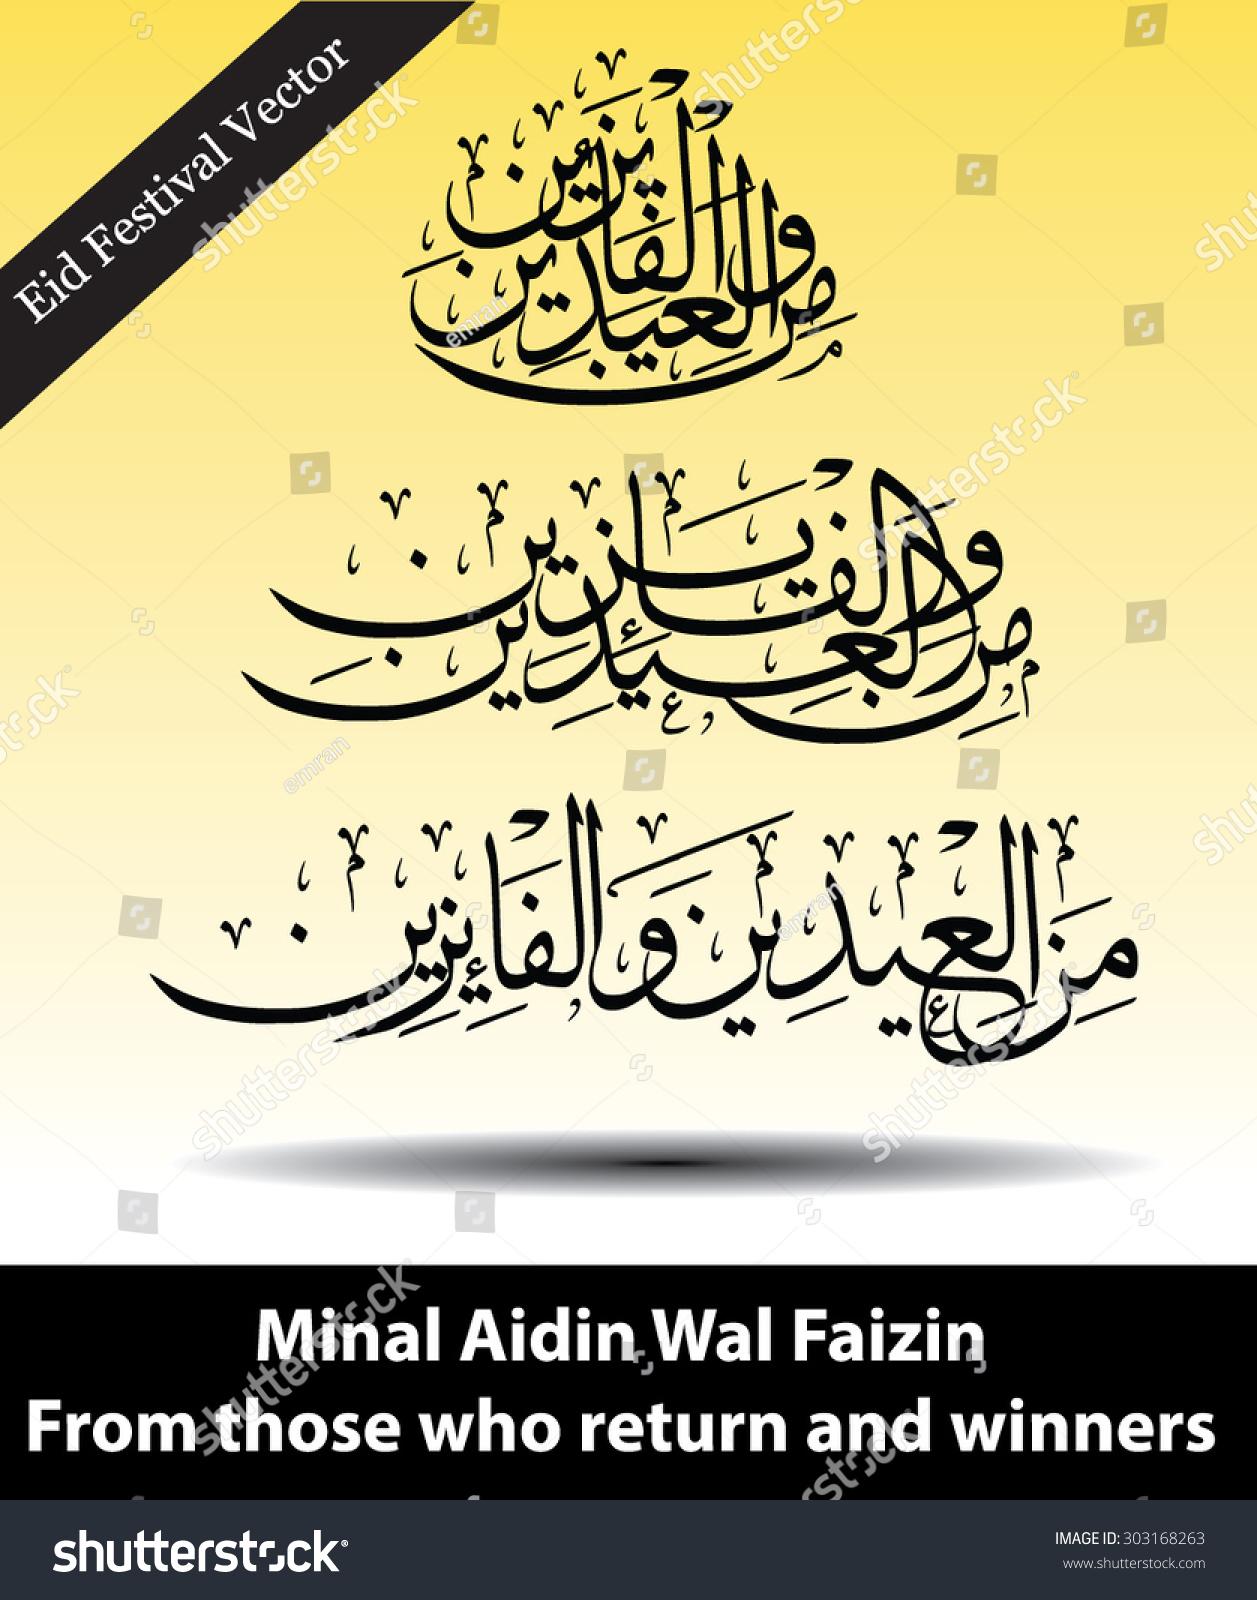 Minal Aidin Wal Faizin Png : minal, aidin, faizin, Three(3), Calligraphy, Vector, Islamic, Phrase, Royalty, Stock, 303168263, Avopix.com